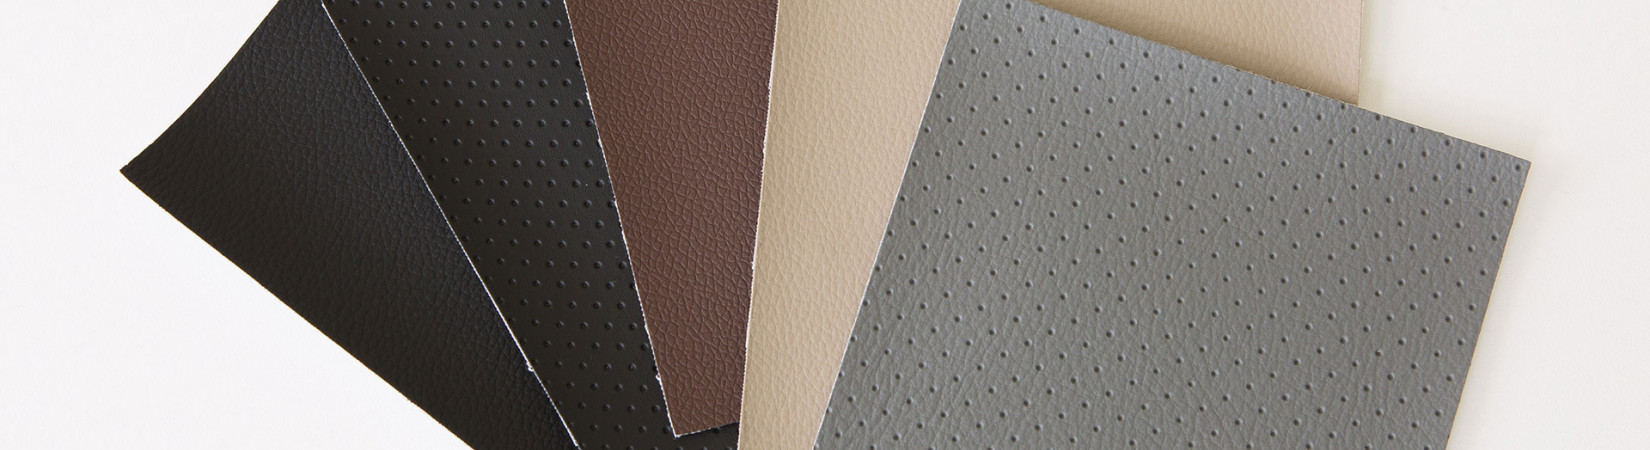 Automotive Artificial Leather